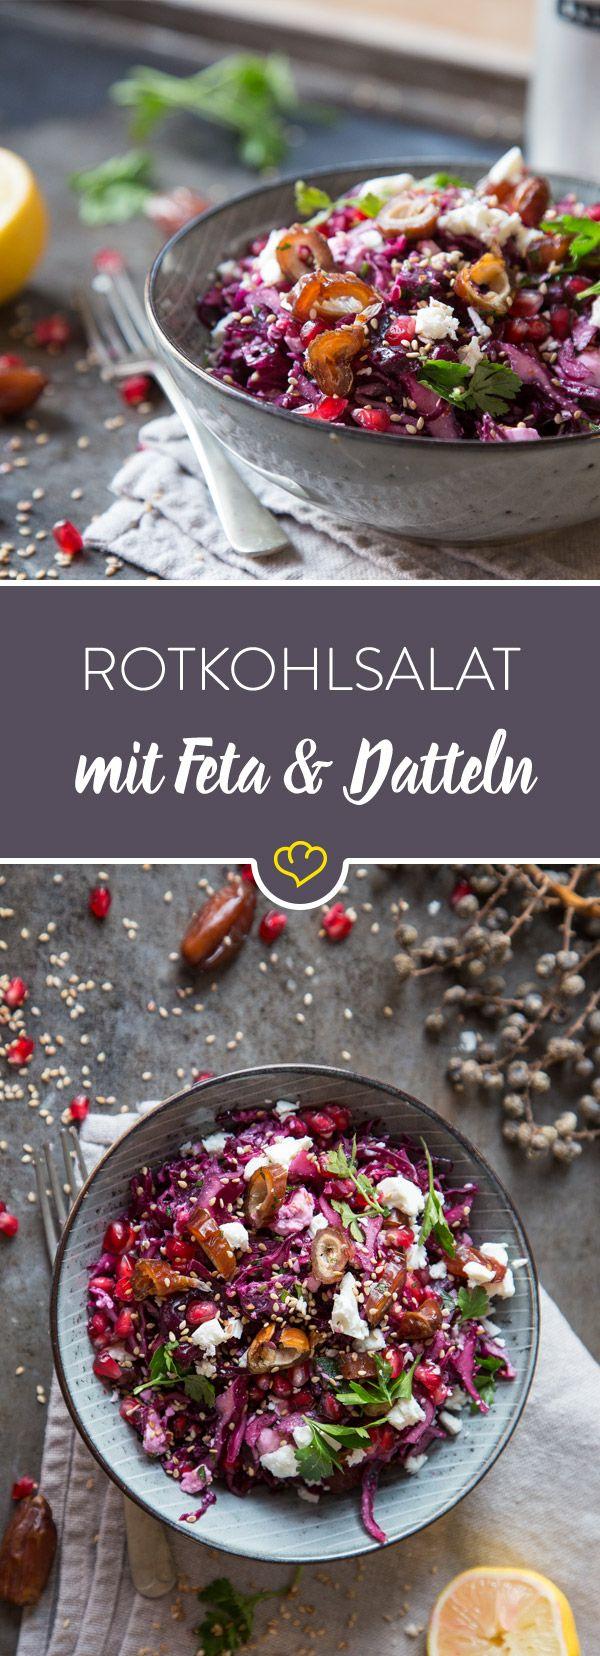 Lauwarmer Rotkohlsalat mit Feta und Datteln #friendsgivingfood